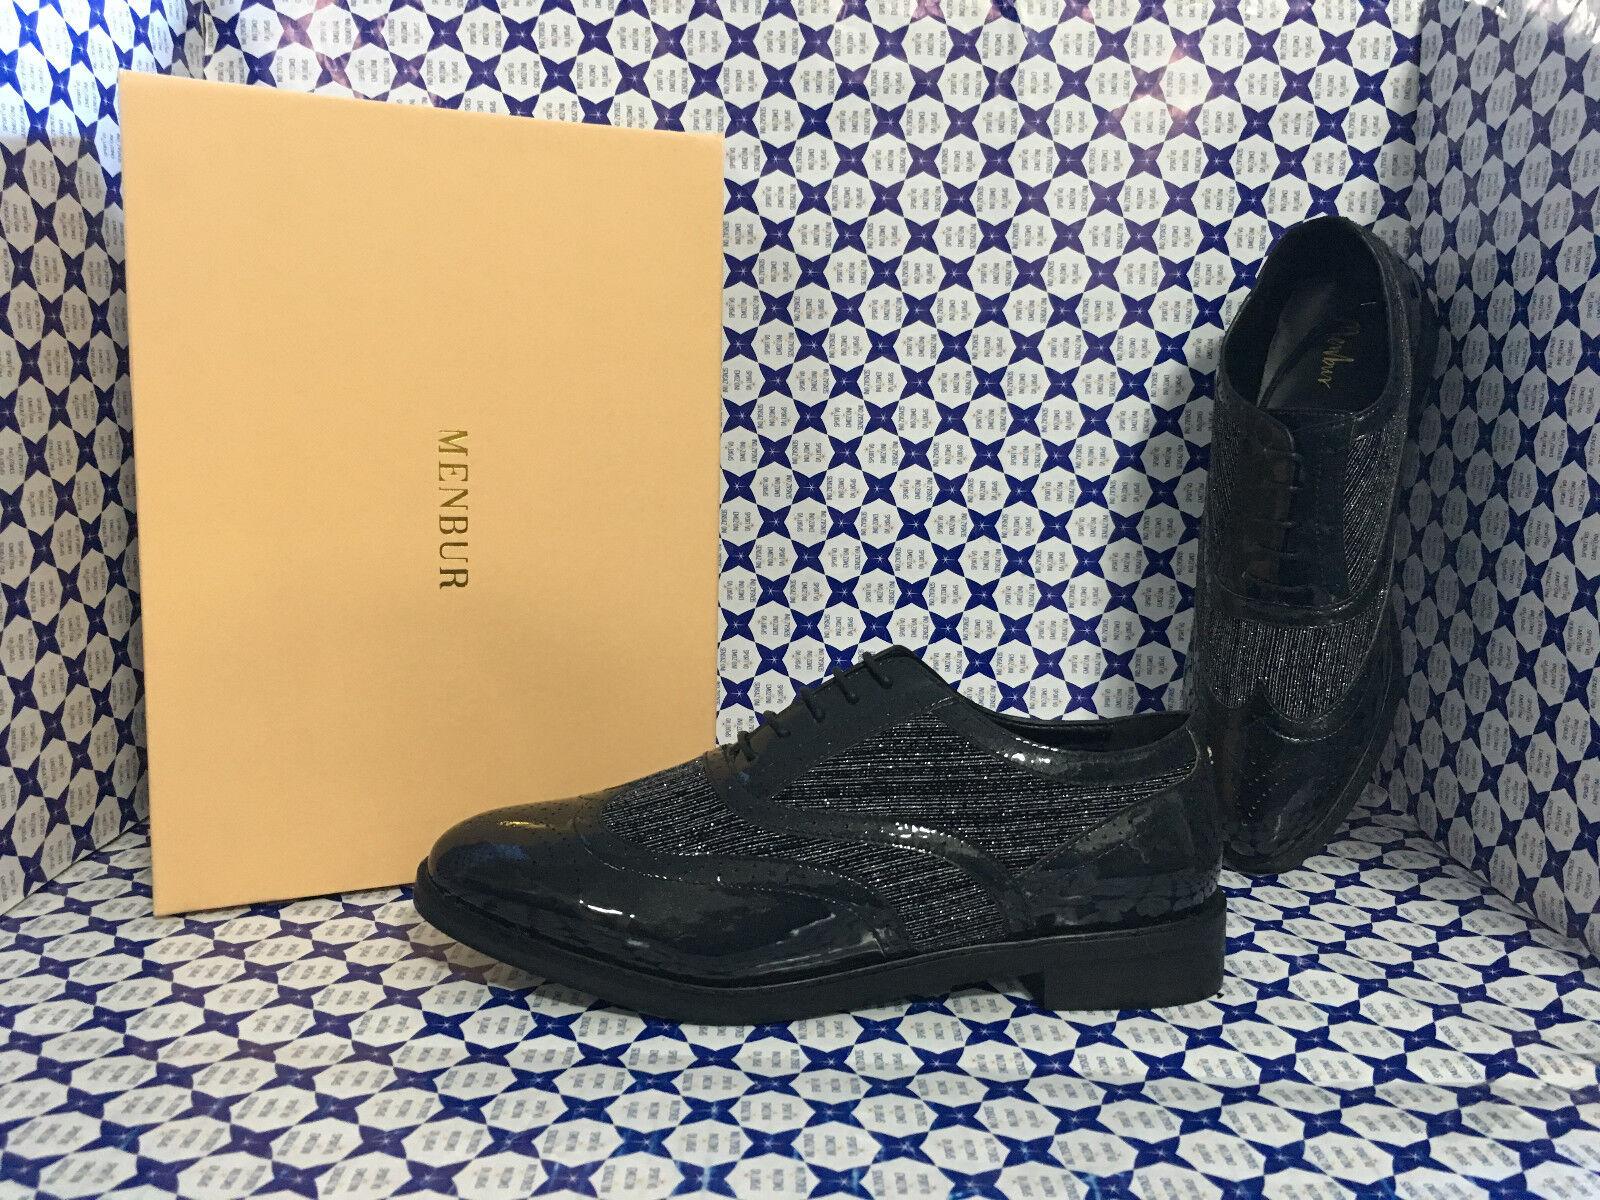 chaussures Menbur femmes - Stringata Coda di Rondine Lurex Vernice - noir- 7739